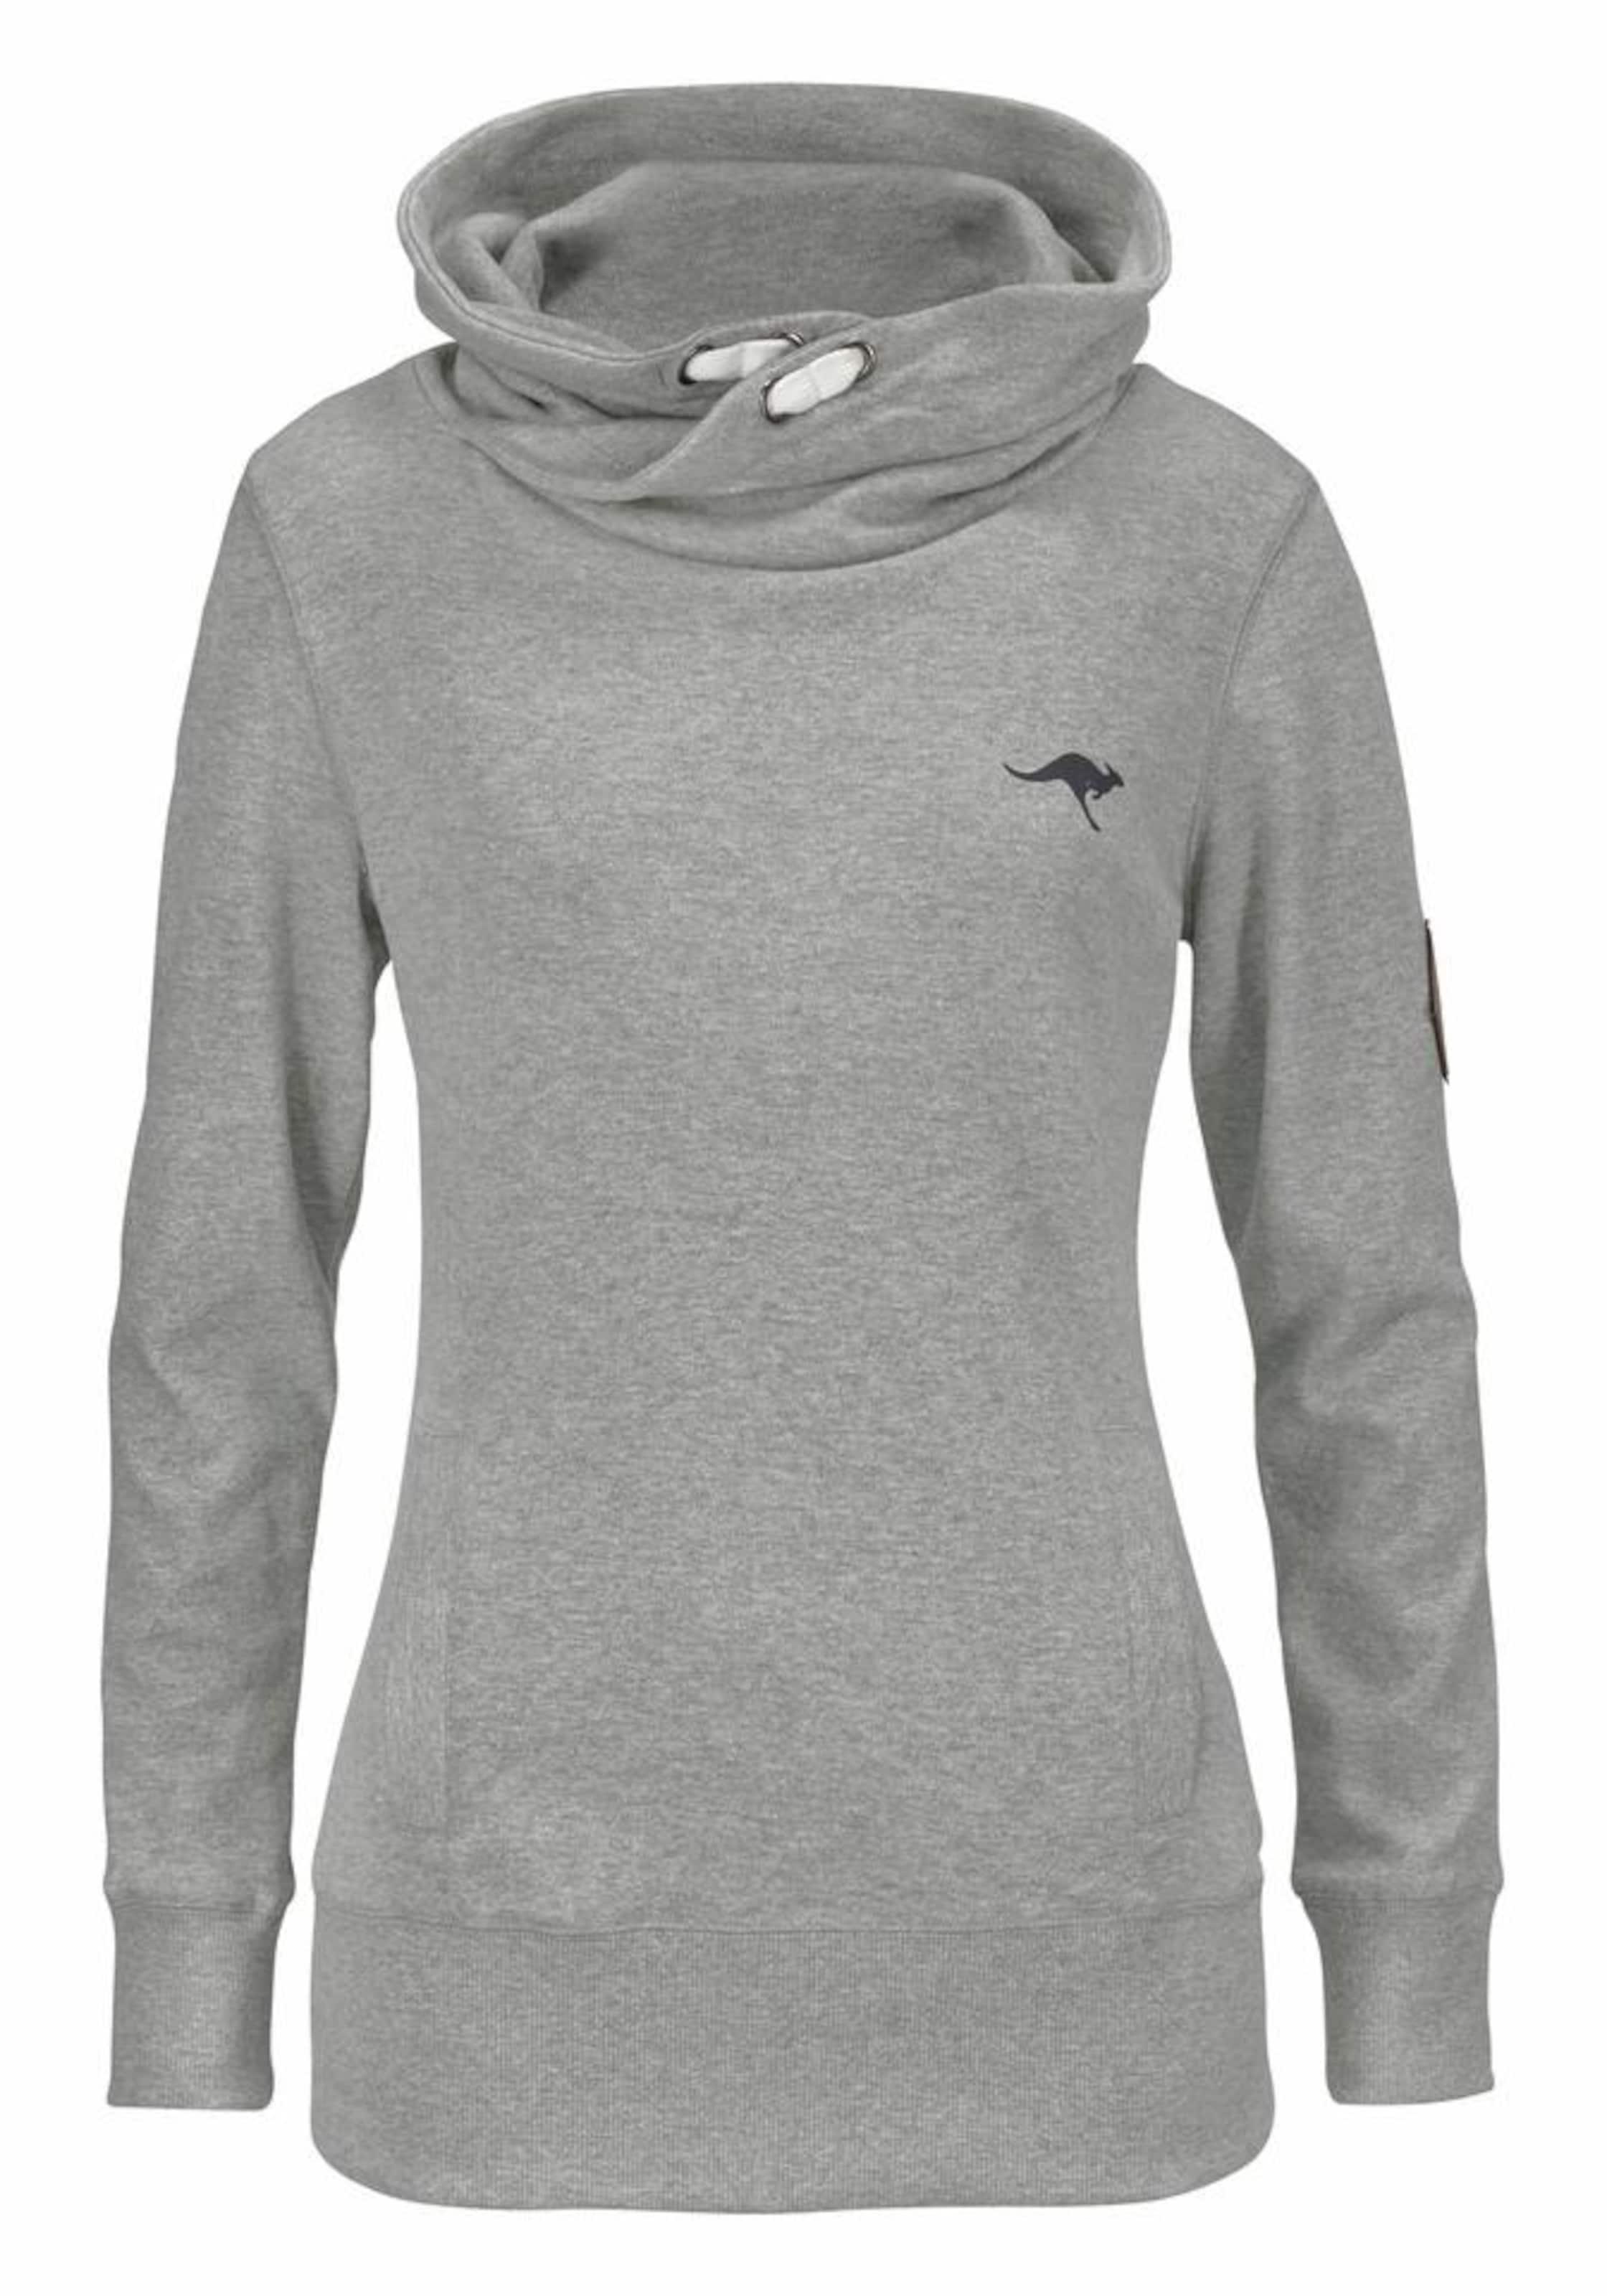 KangaROOS Sweatshirt Steckdose Genießen Rabatt Besuch Neu Verkauf 2018 Neueste VlZcdib